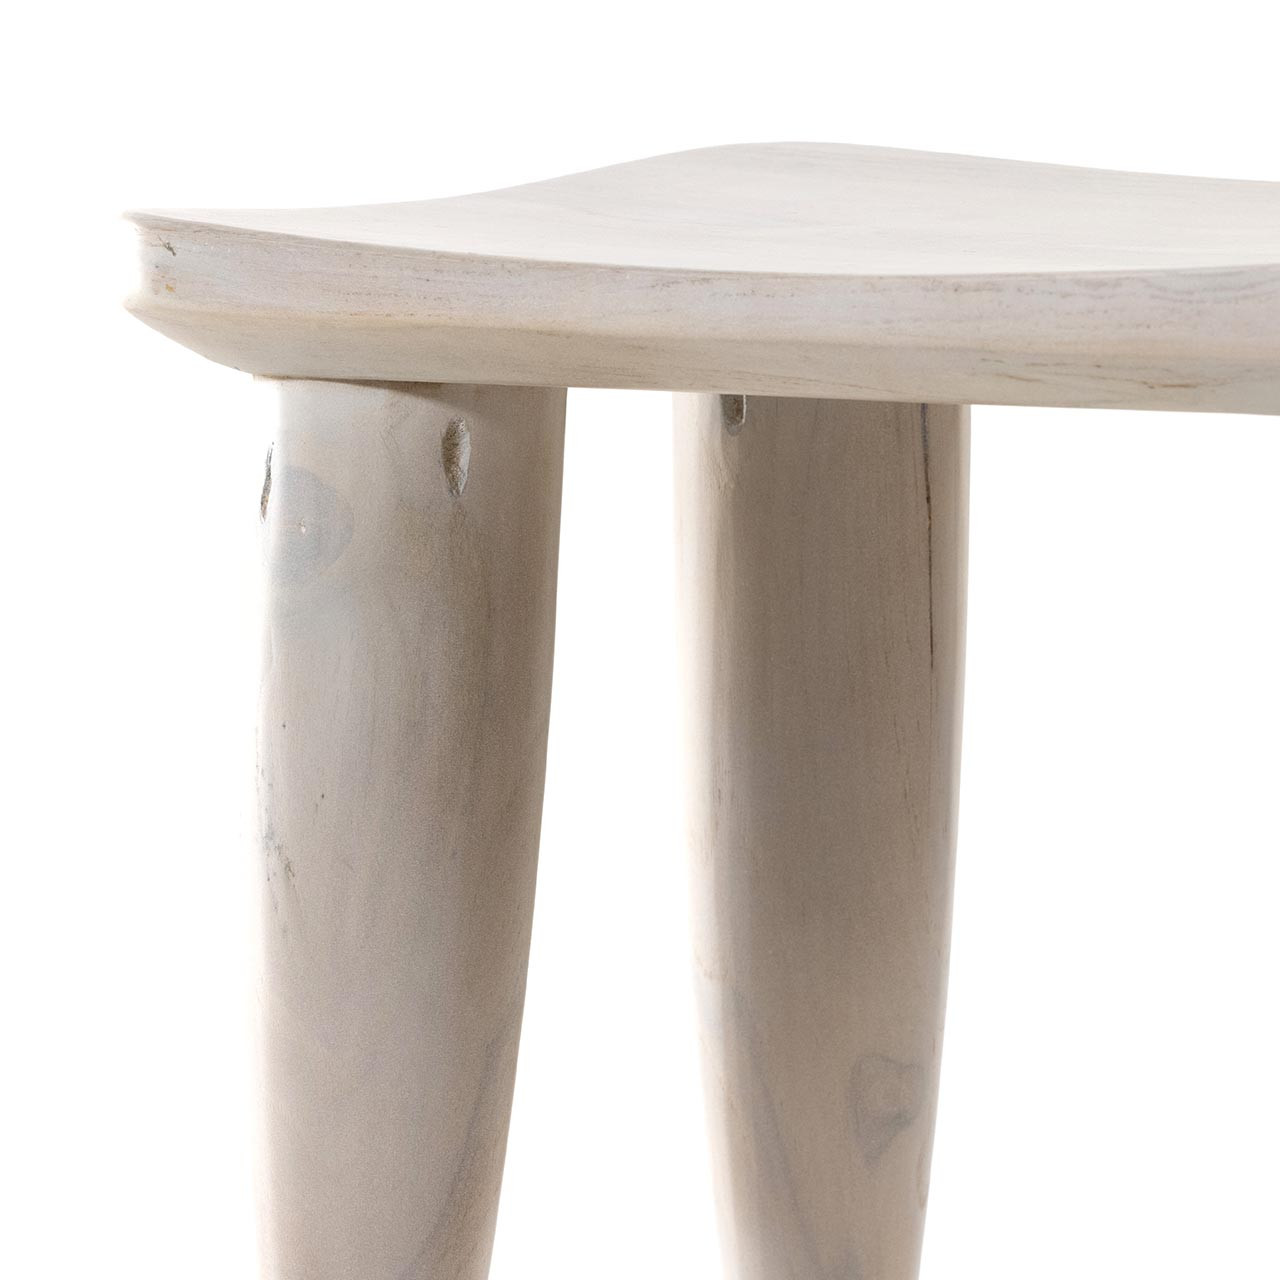 Khate Teak Outdoor Stool Table